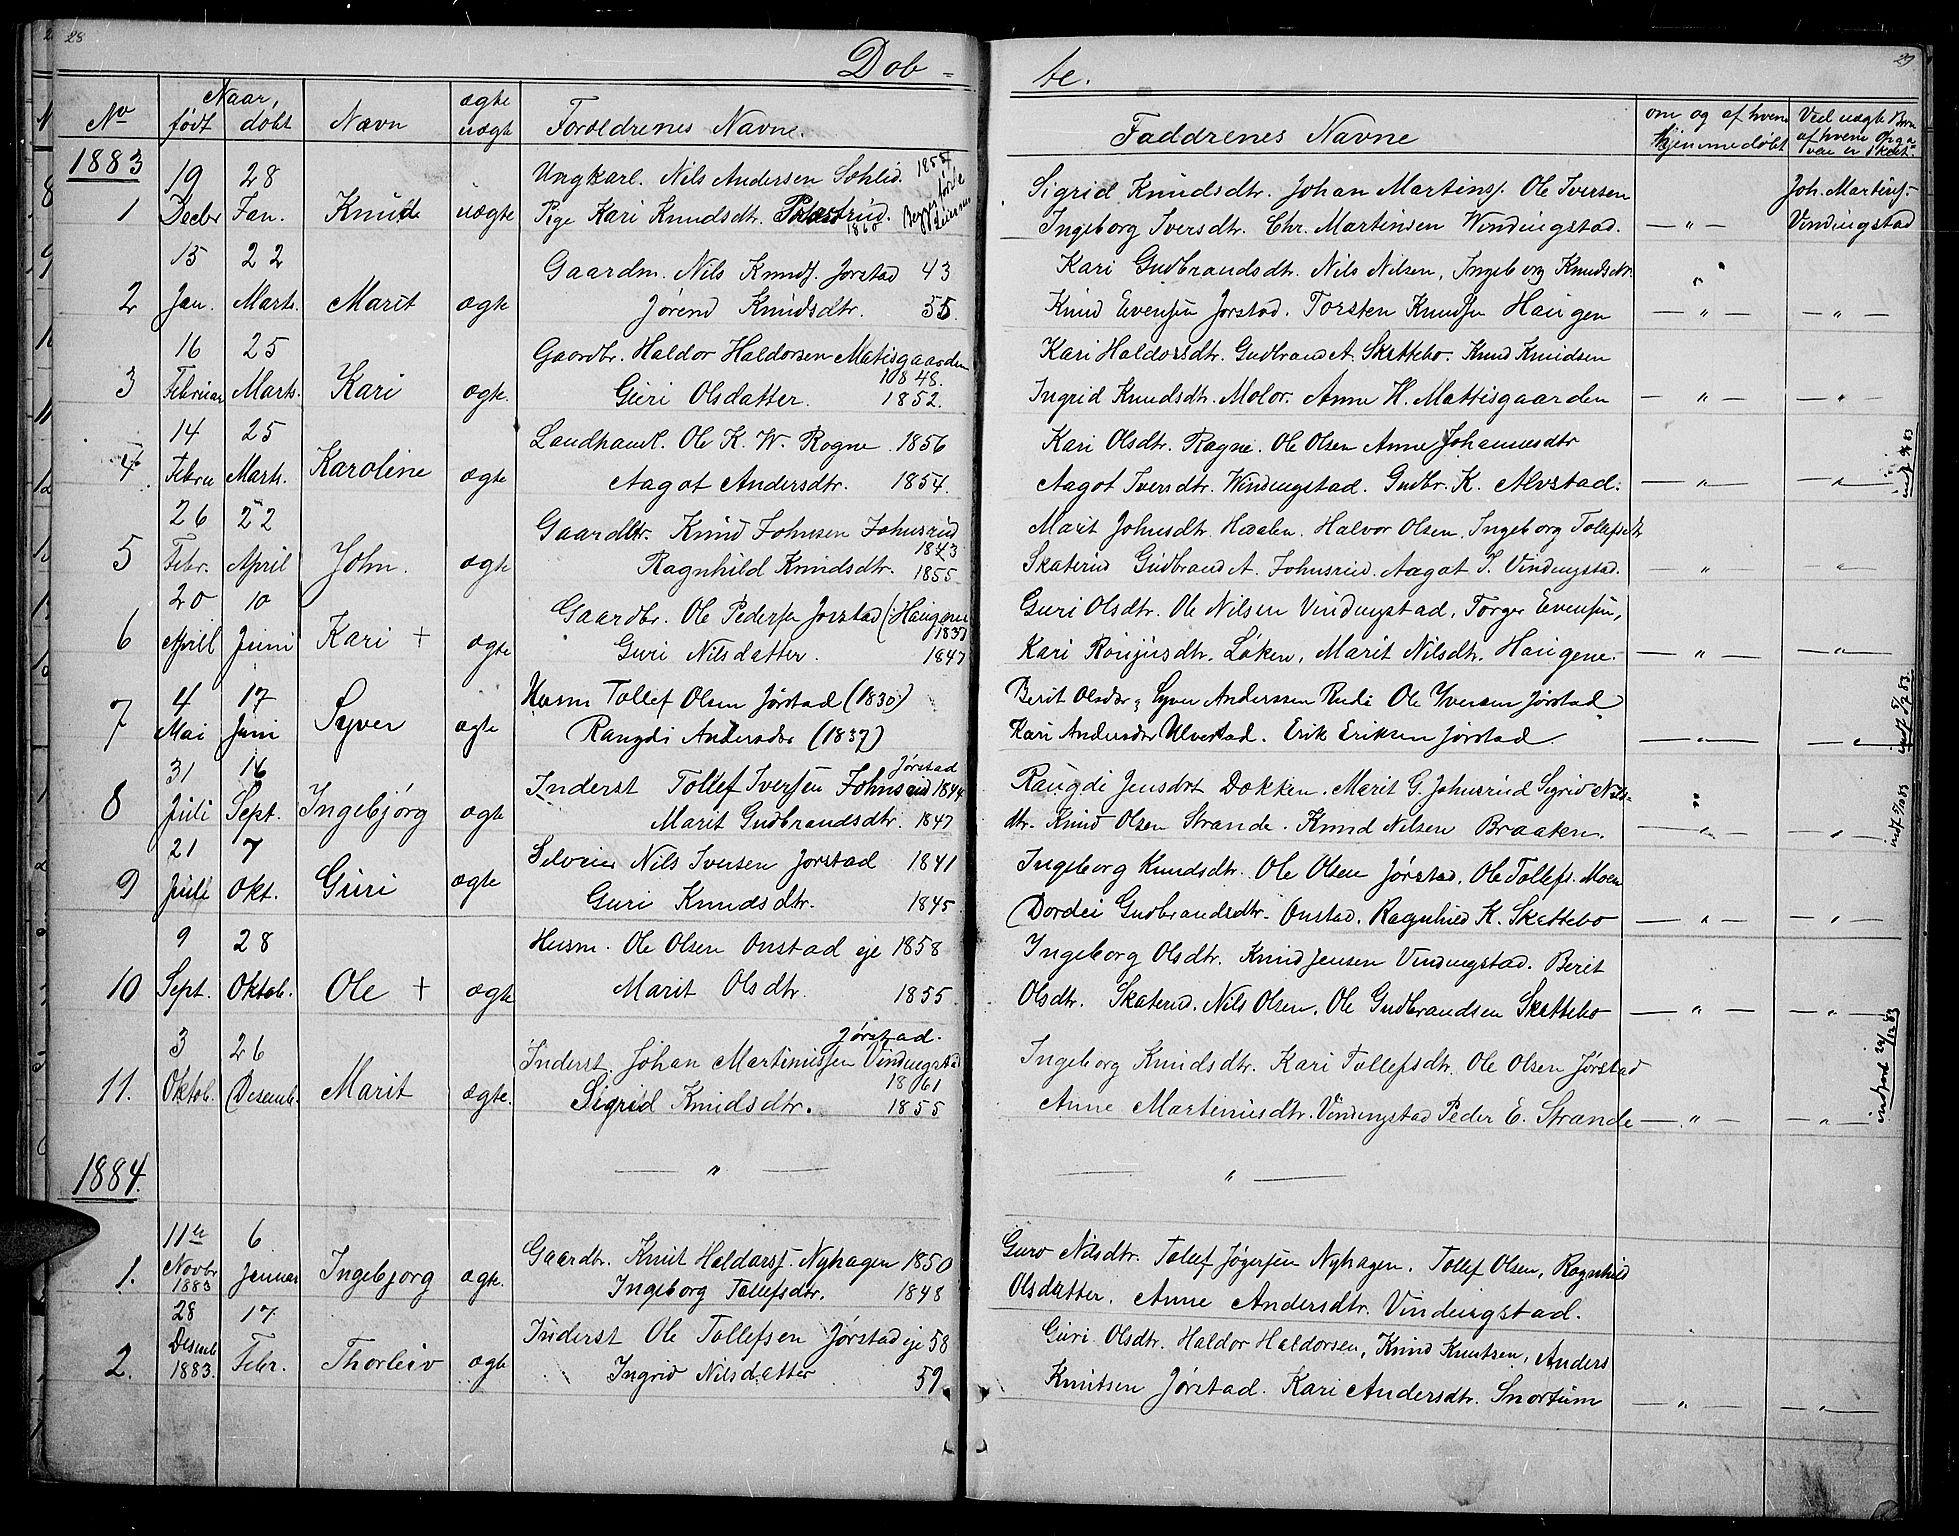 SAH, Øystre Slidre prestekontor, Klokkerbok nr. 2, 1866-1886, s. 28-29